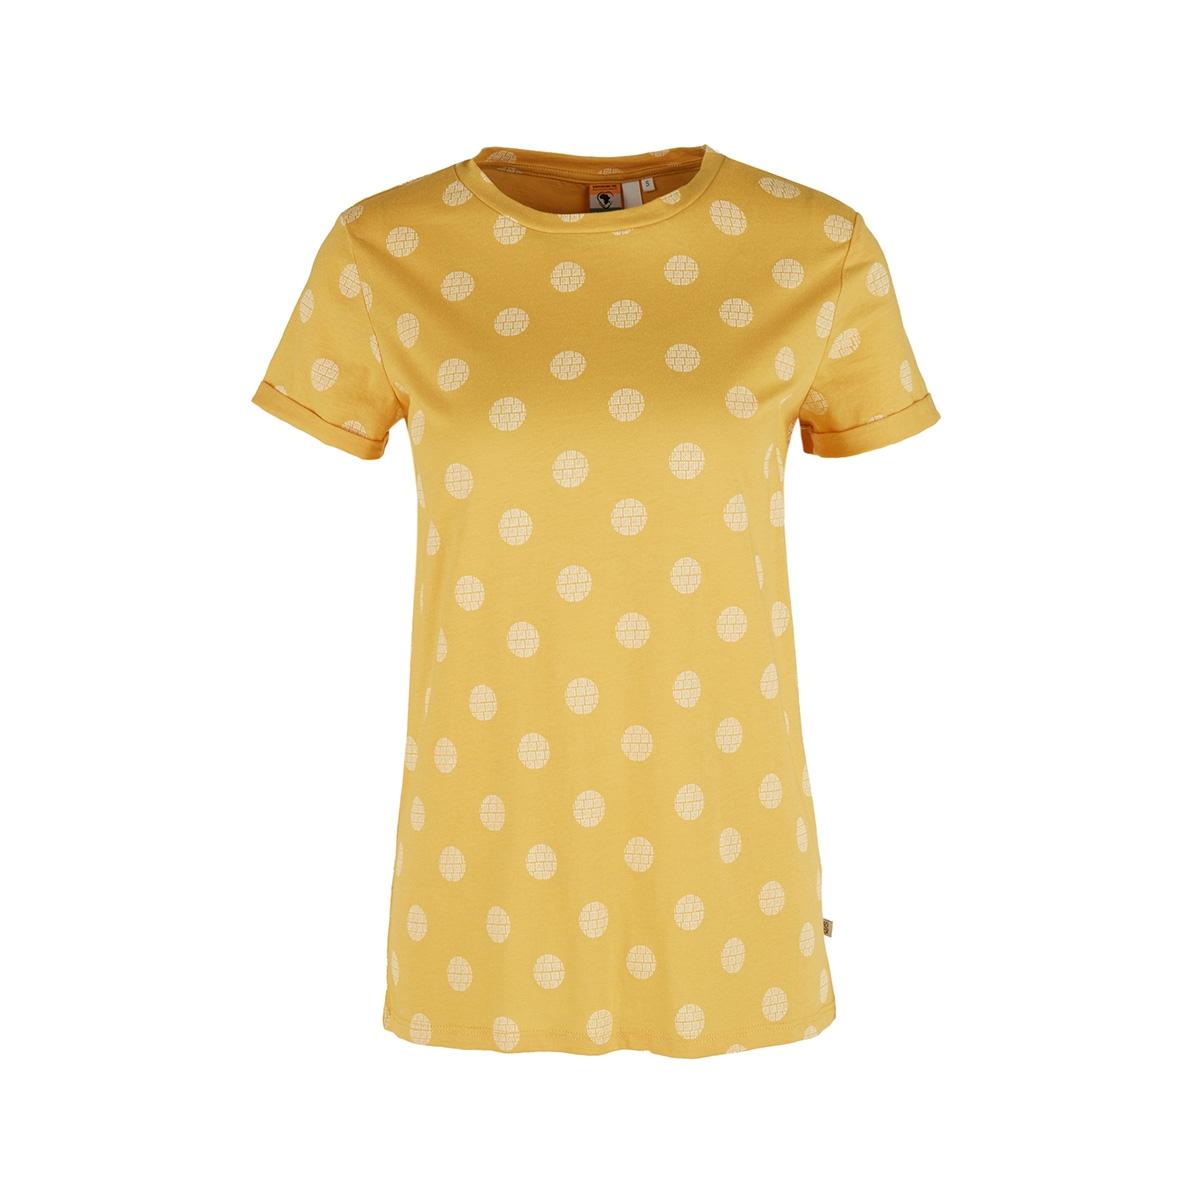 t shirt met tekst cirkels 46001325593 q/s designed by t-shirt 15a0